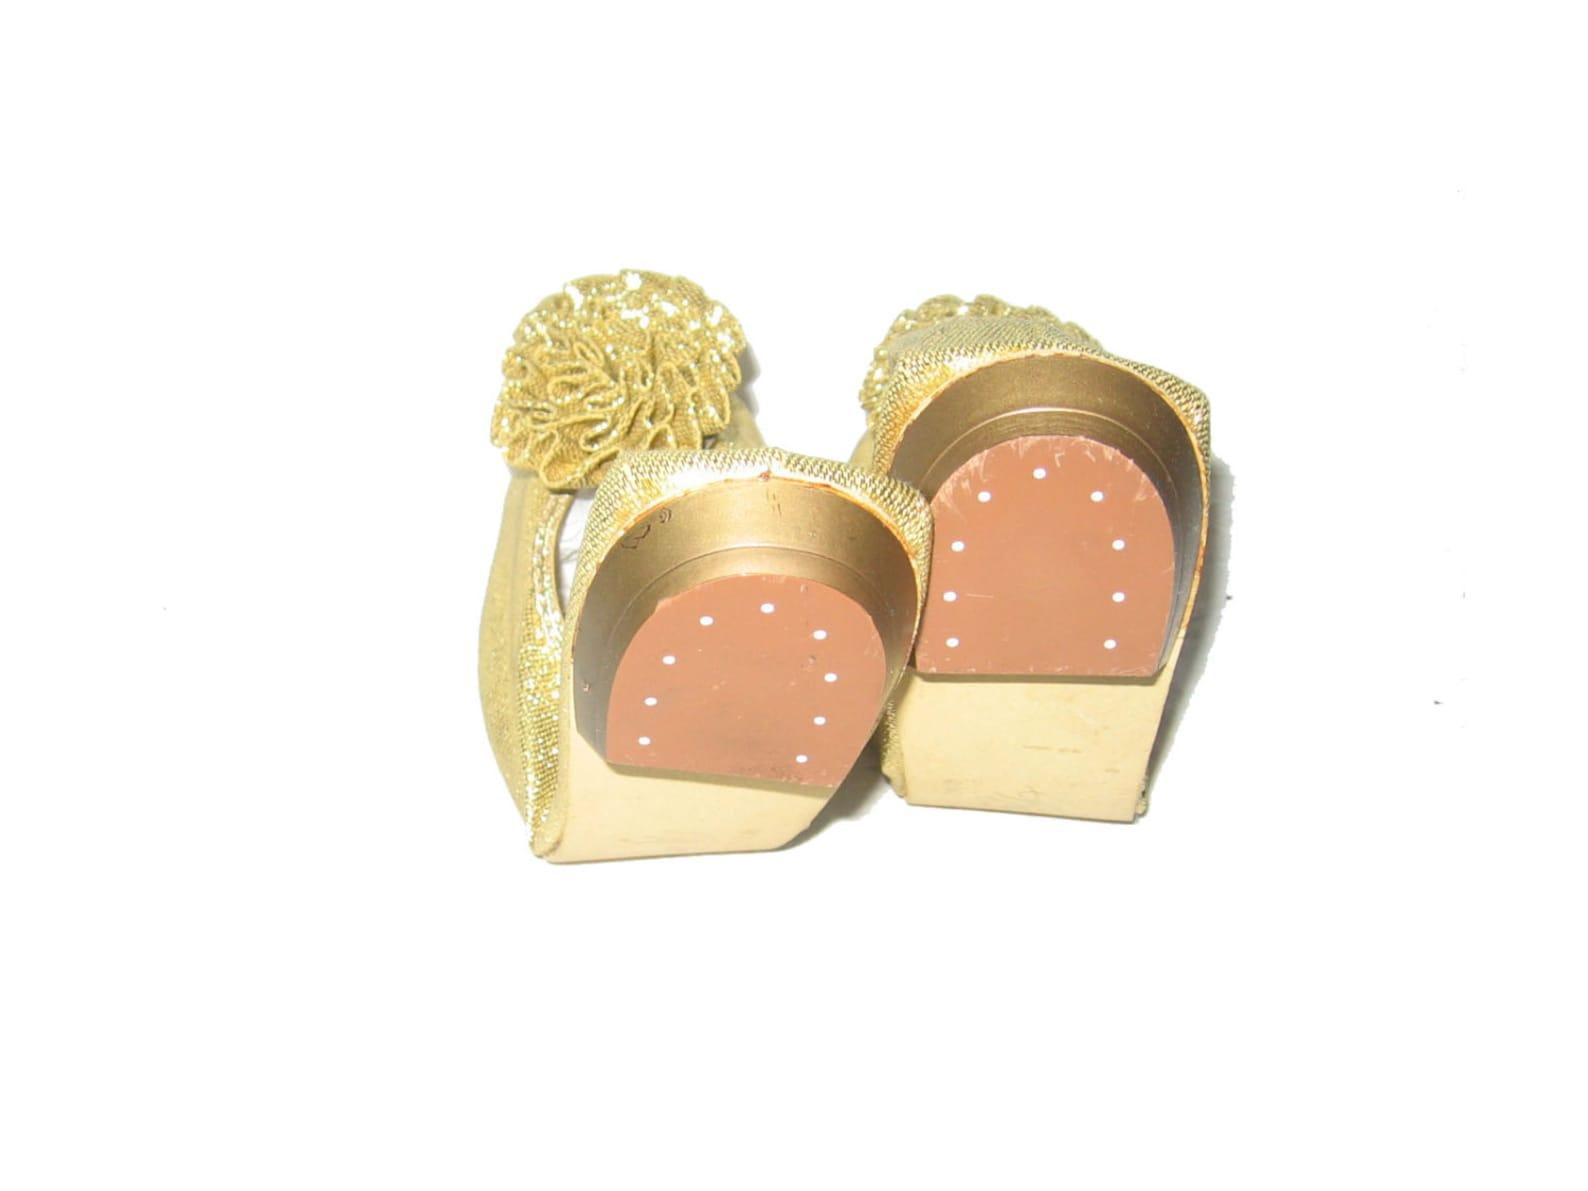 vtg rare stunning bertlyn new york metallic gold lurex lame flat heel rosette twiggy era mod ballet flat stretch shoes size med